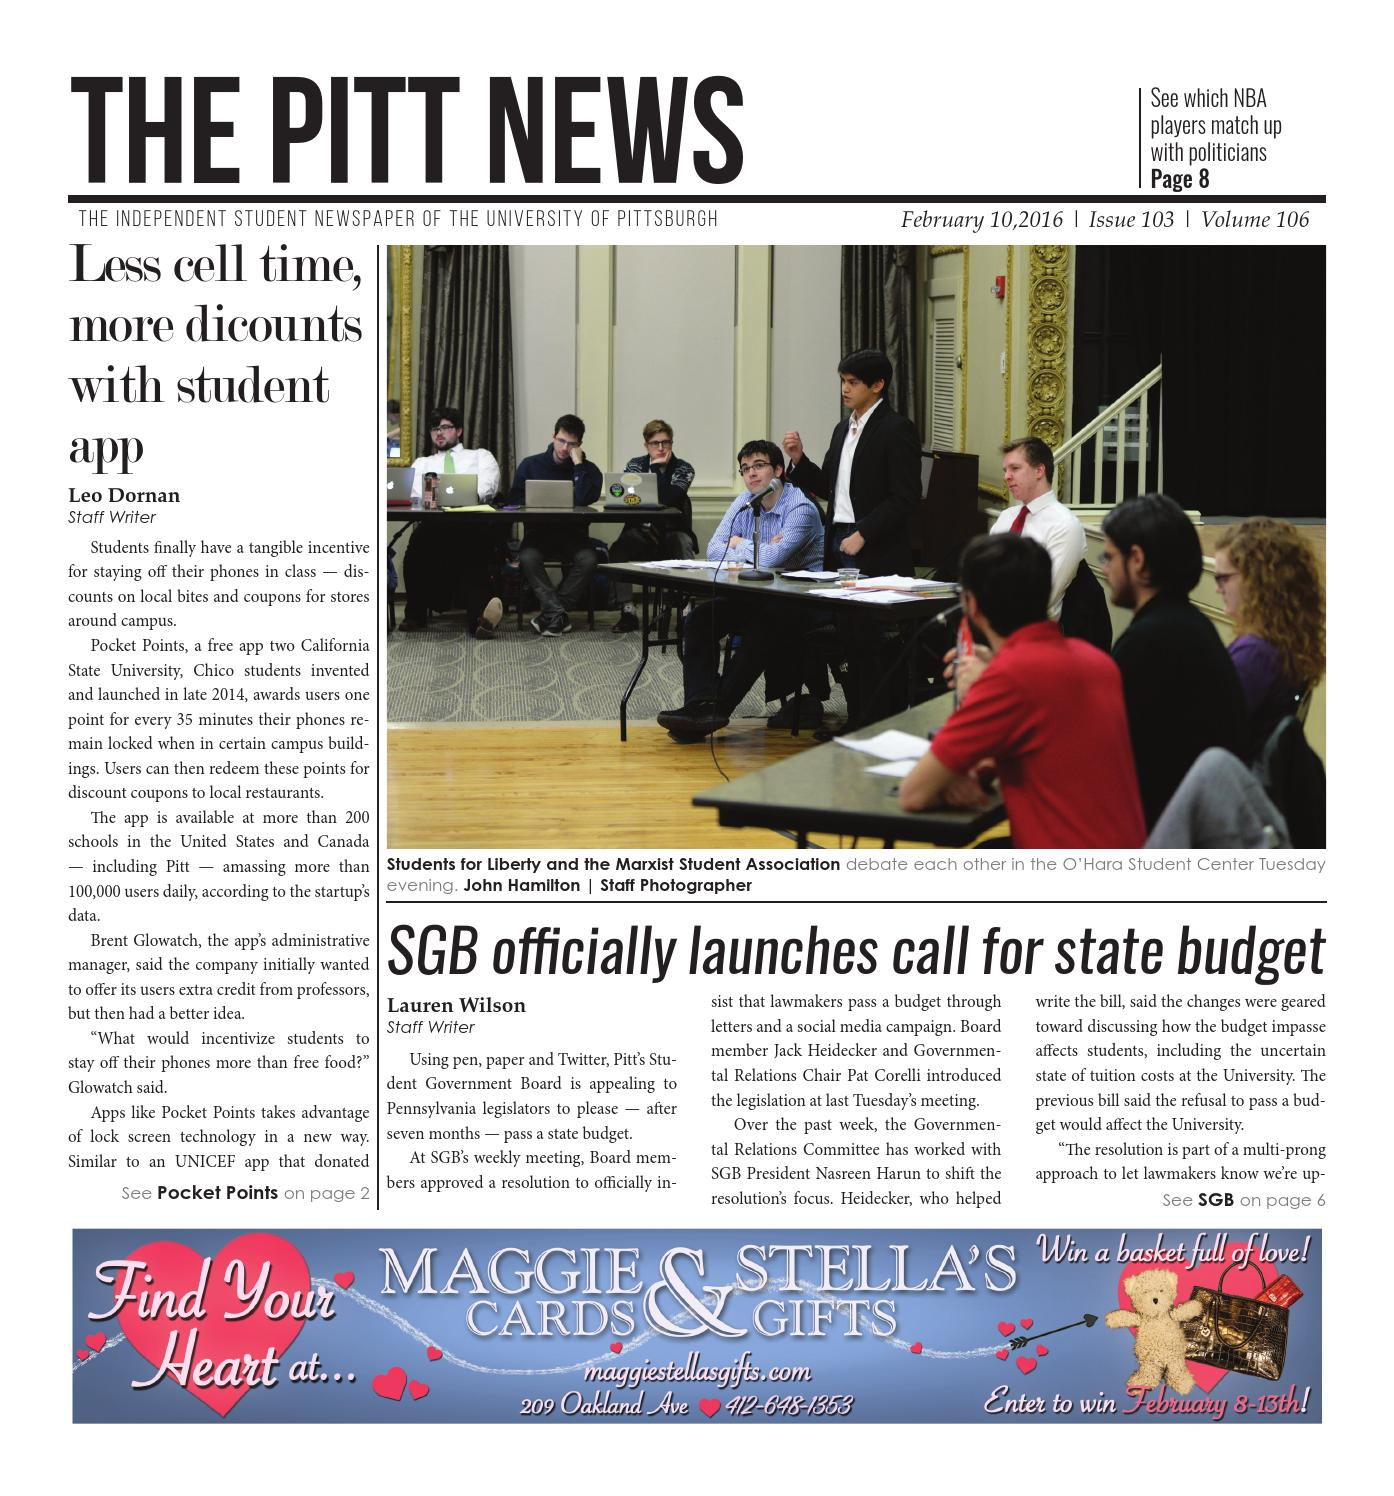 2-10-16 by The Pitt News - issuu